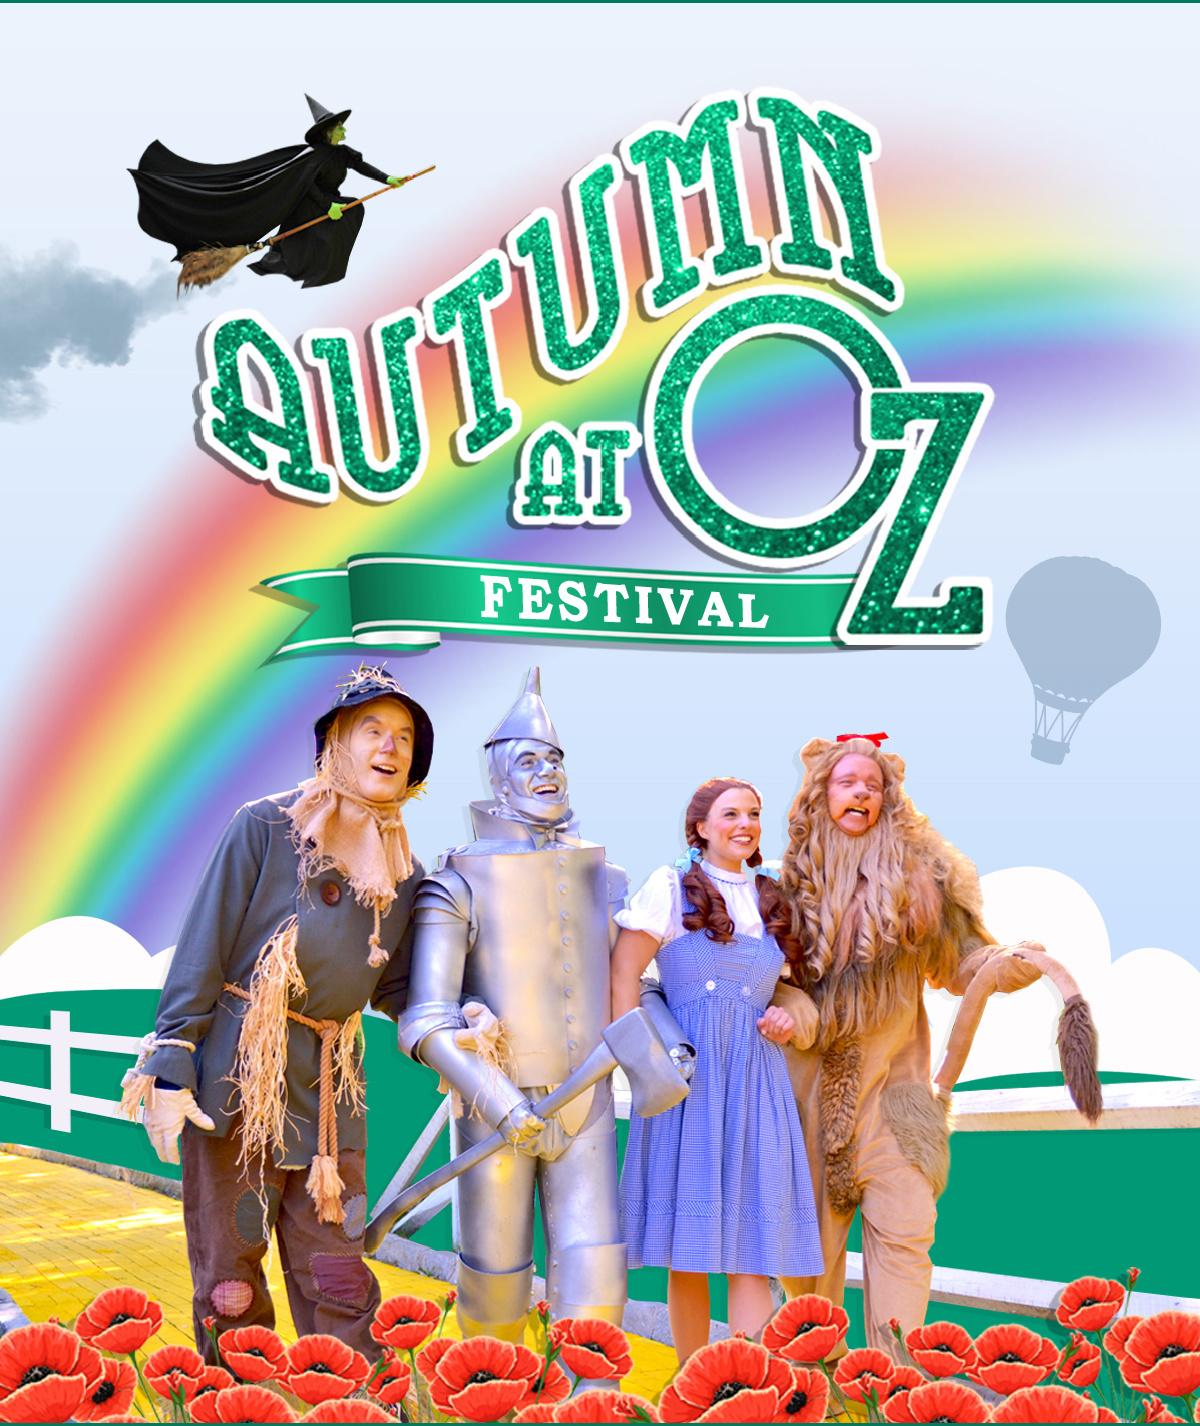 Autumn at Oz festival